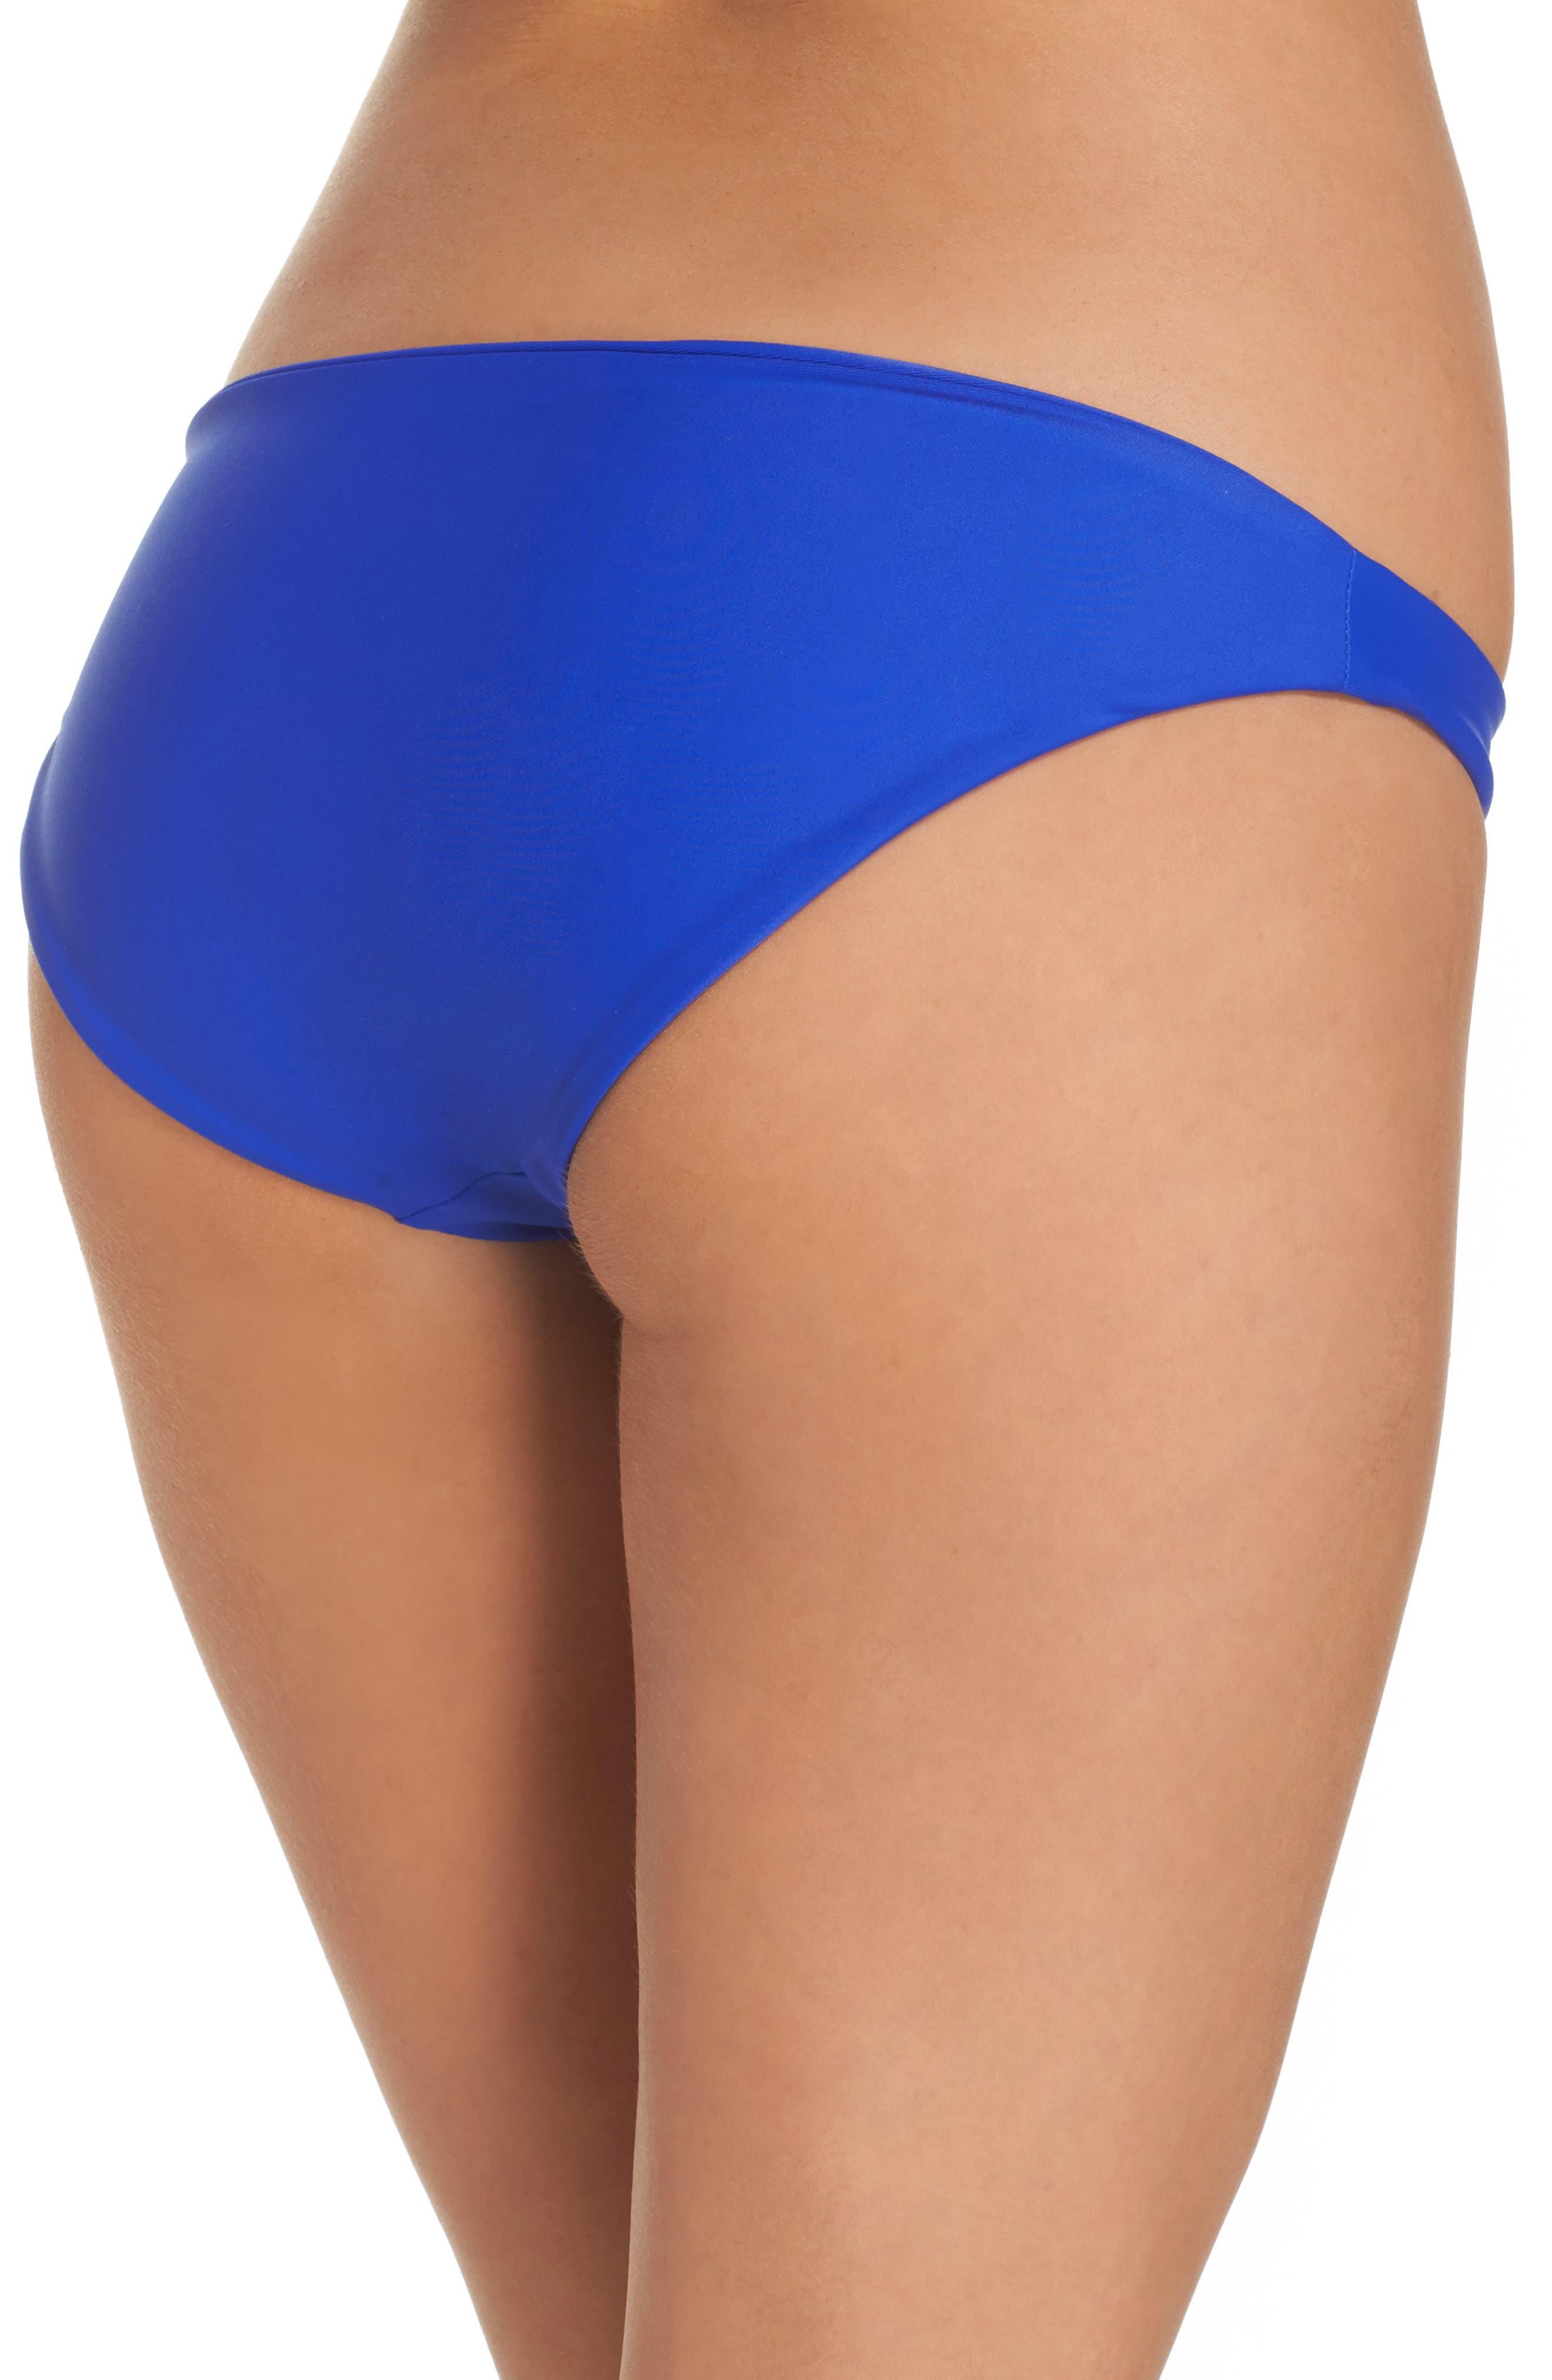 Zuma Bikini Bottoms,                             Alternate thumbnail 2, color,                             Electric Eel